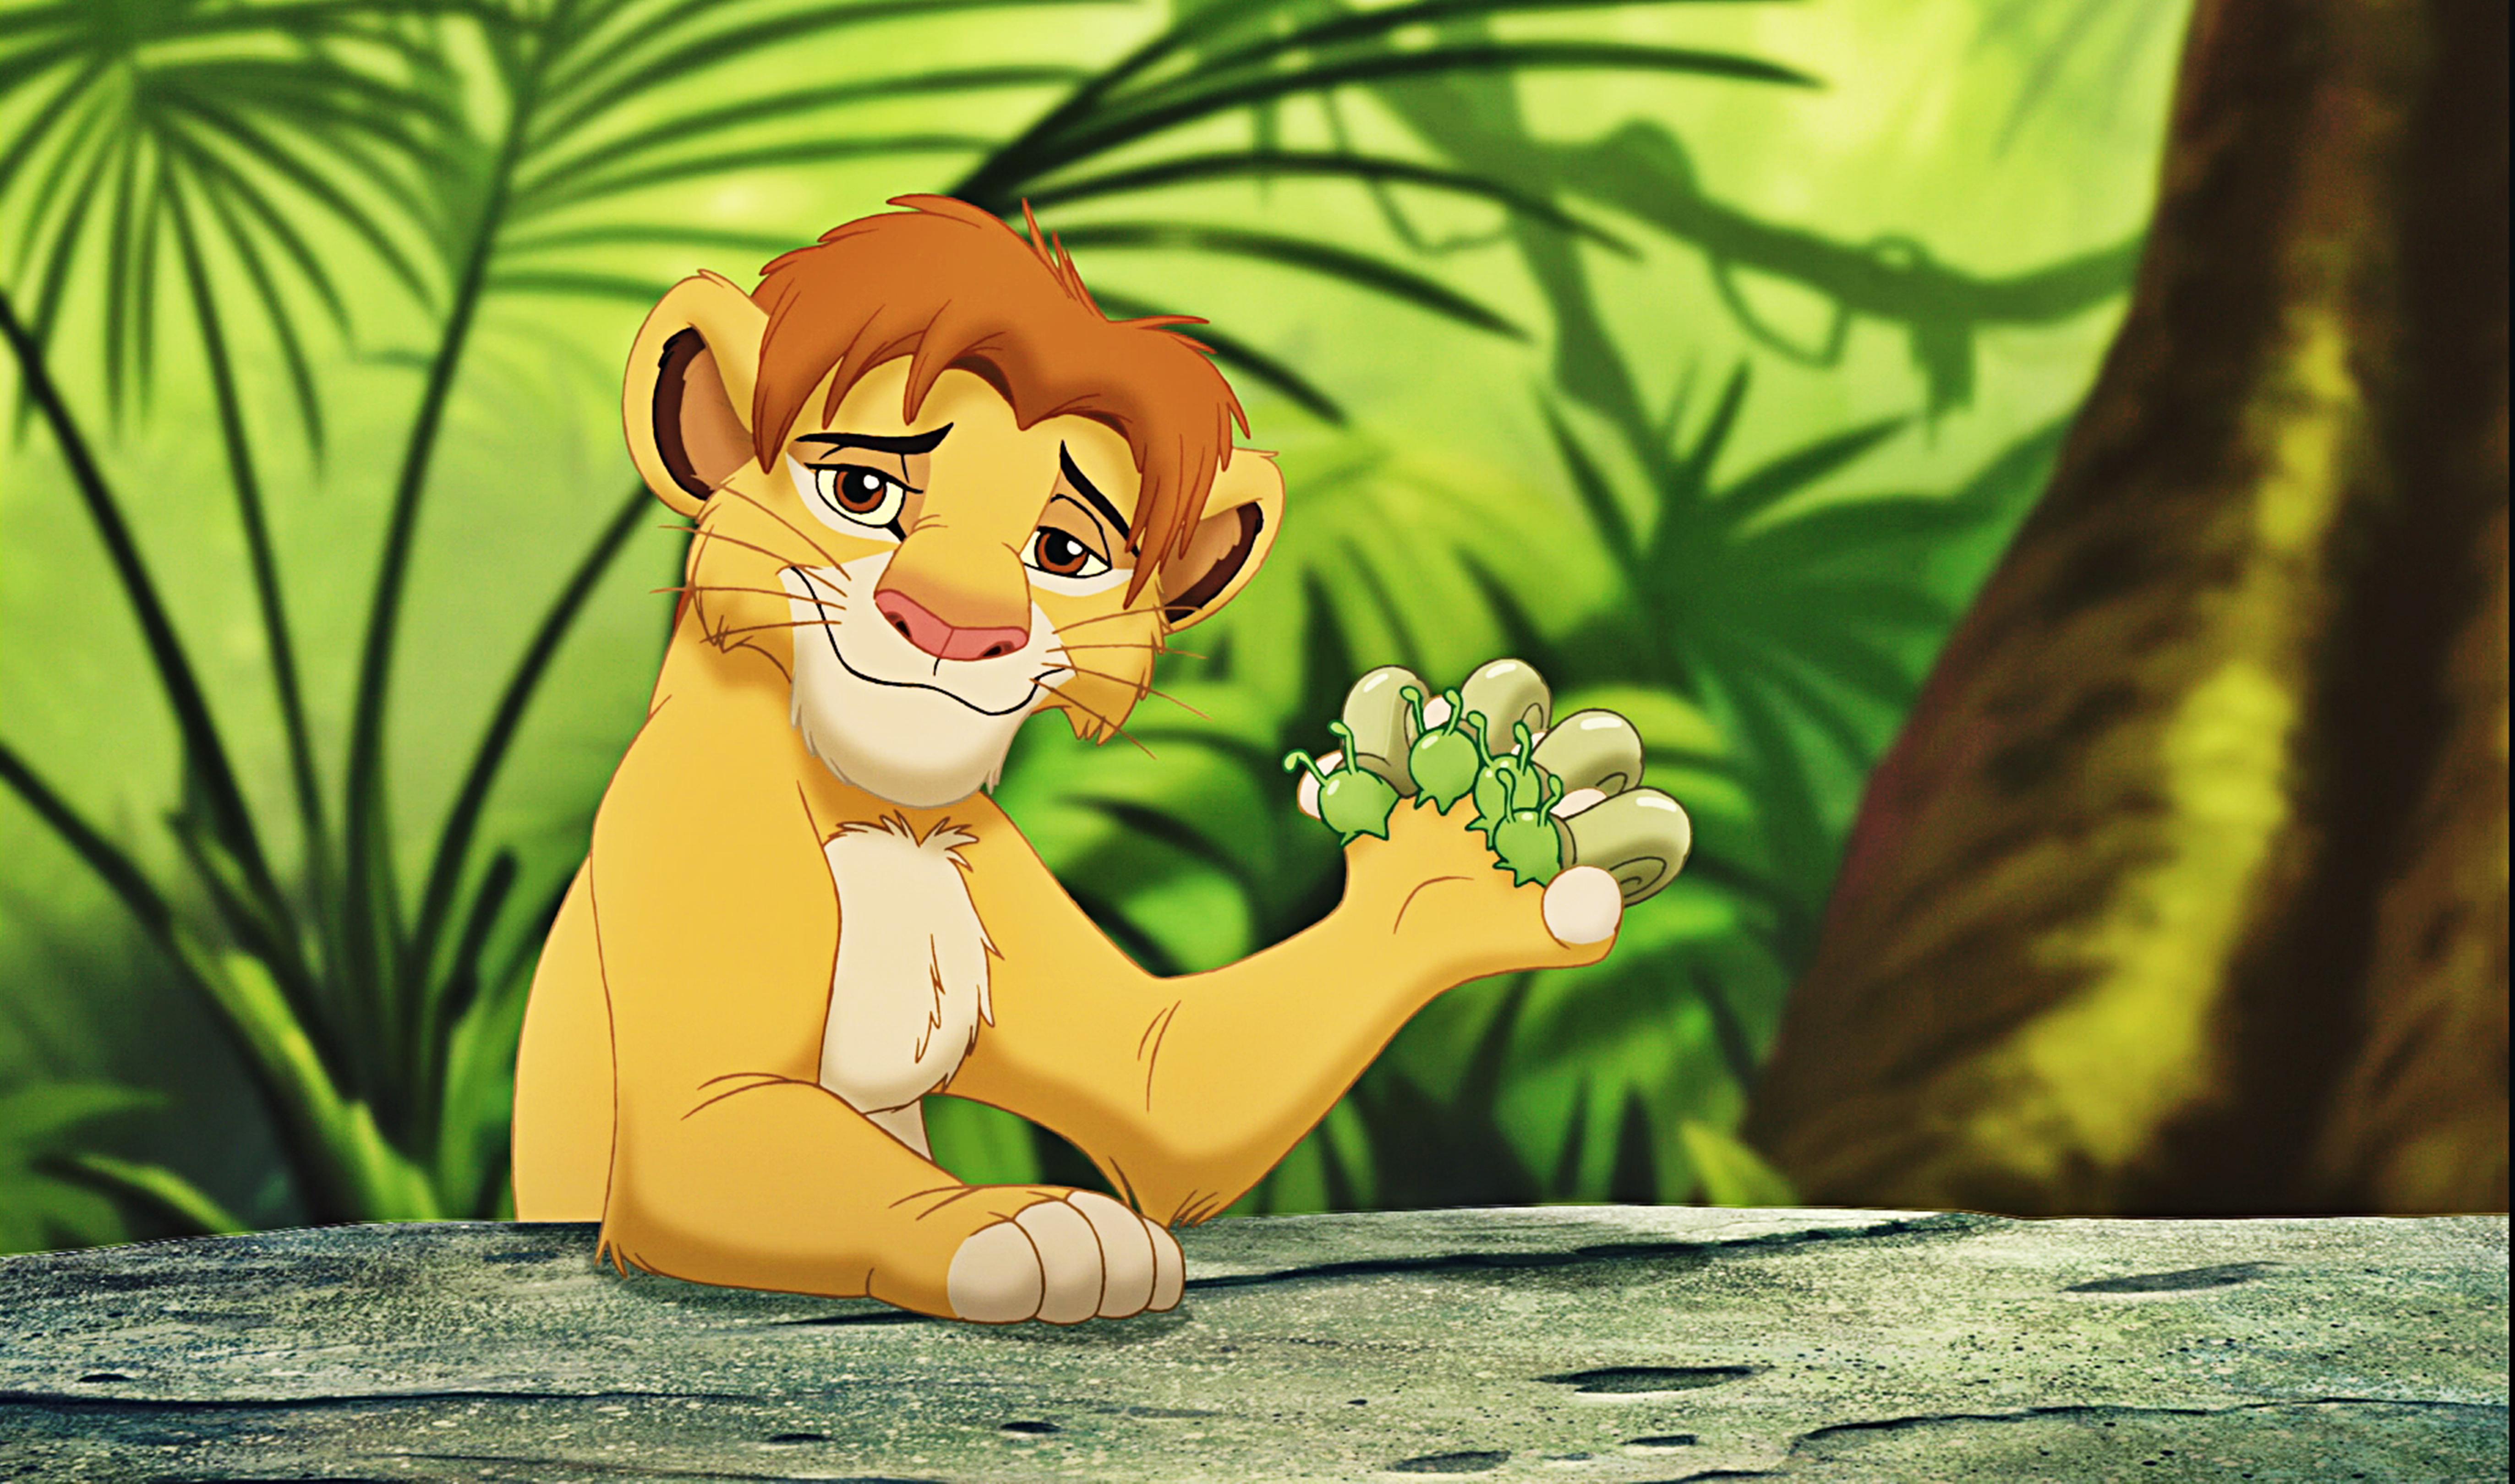 Walt ディズニー Screencaps - Simba